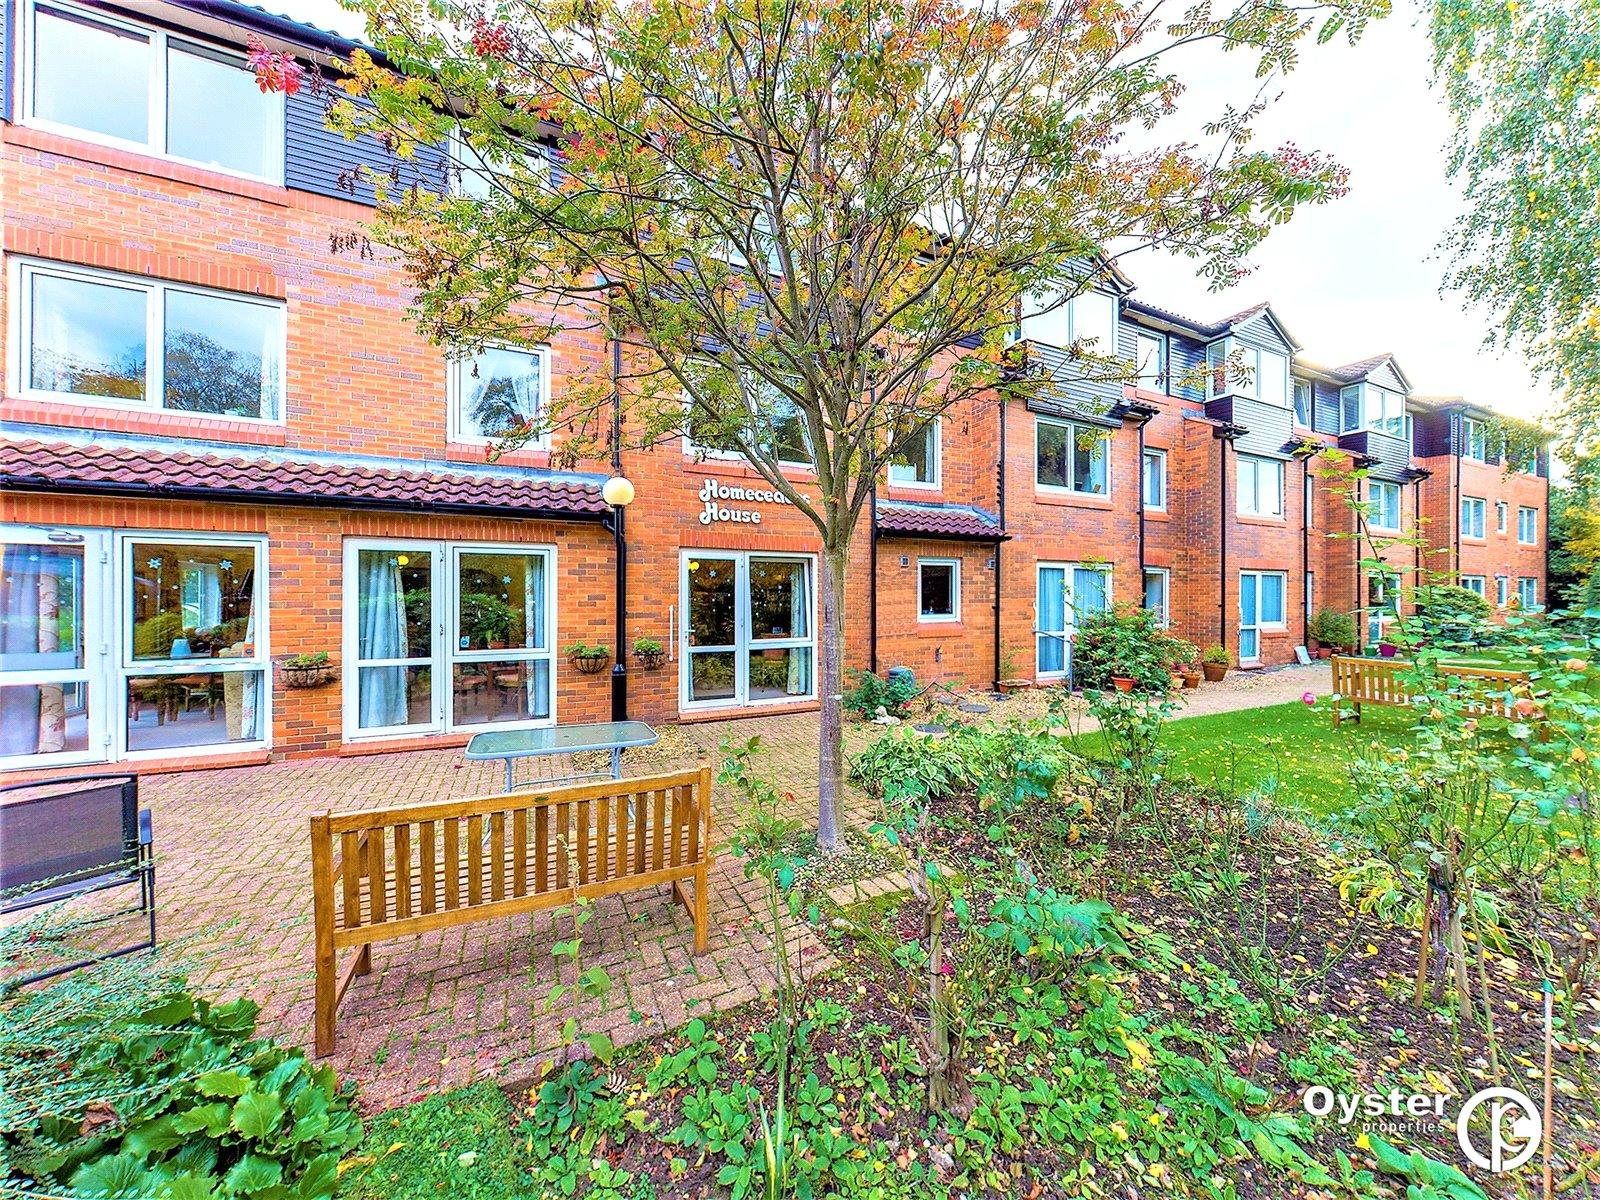 Homecedars House, Elstree Road, Bushey, Hertfordshire WD23